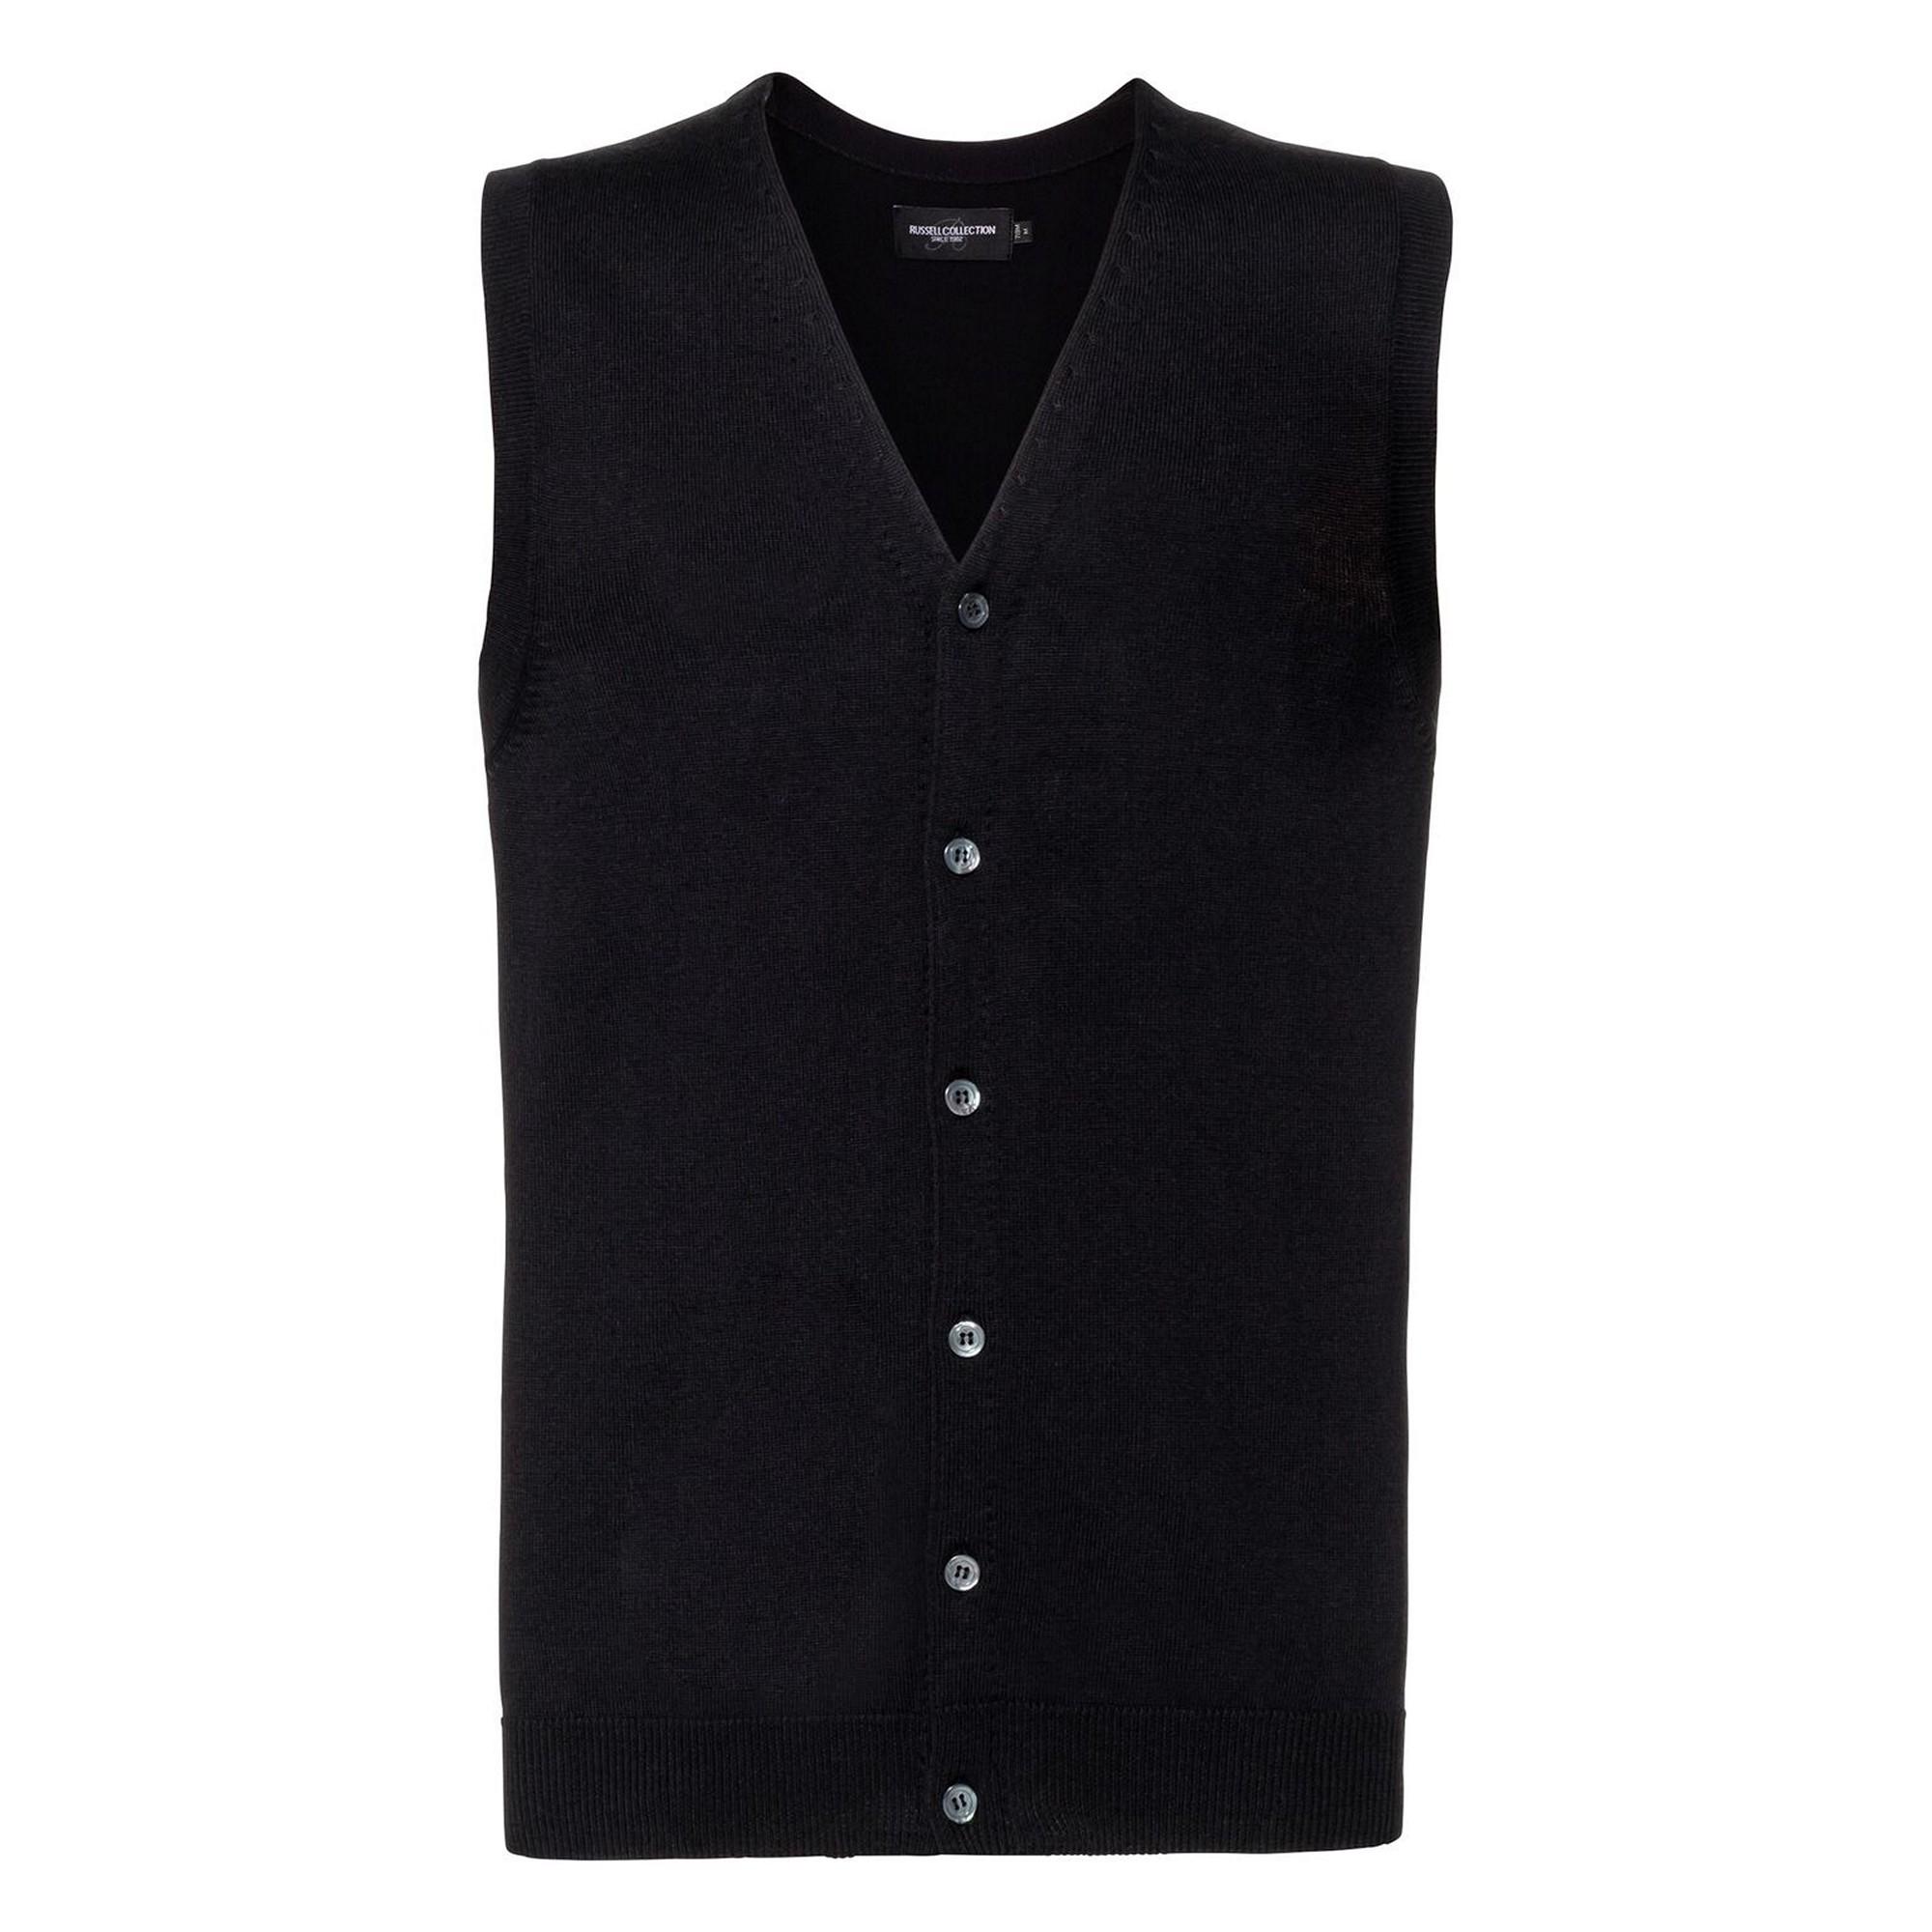 Russell Mens Sleeveless Cotton Acrylic V Neck Cardigan (2XS) (Black)